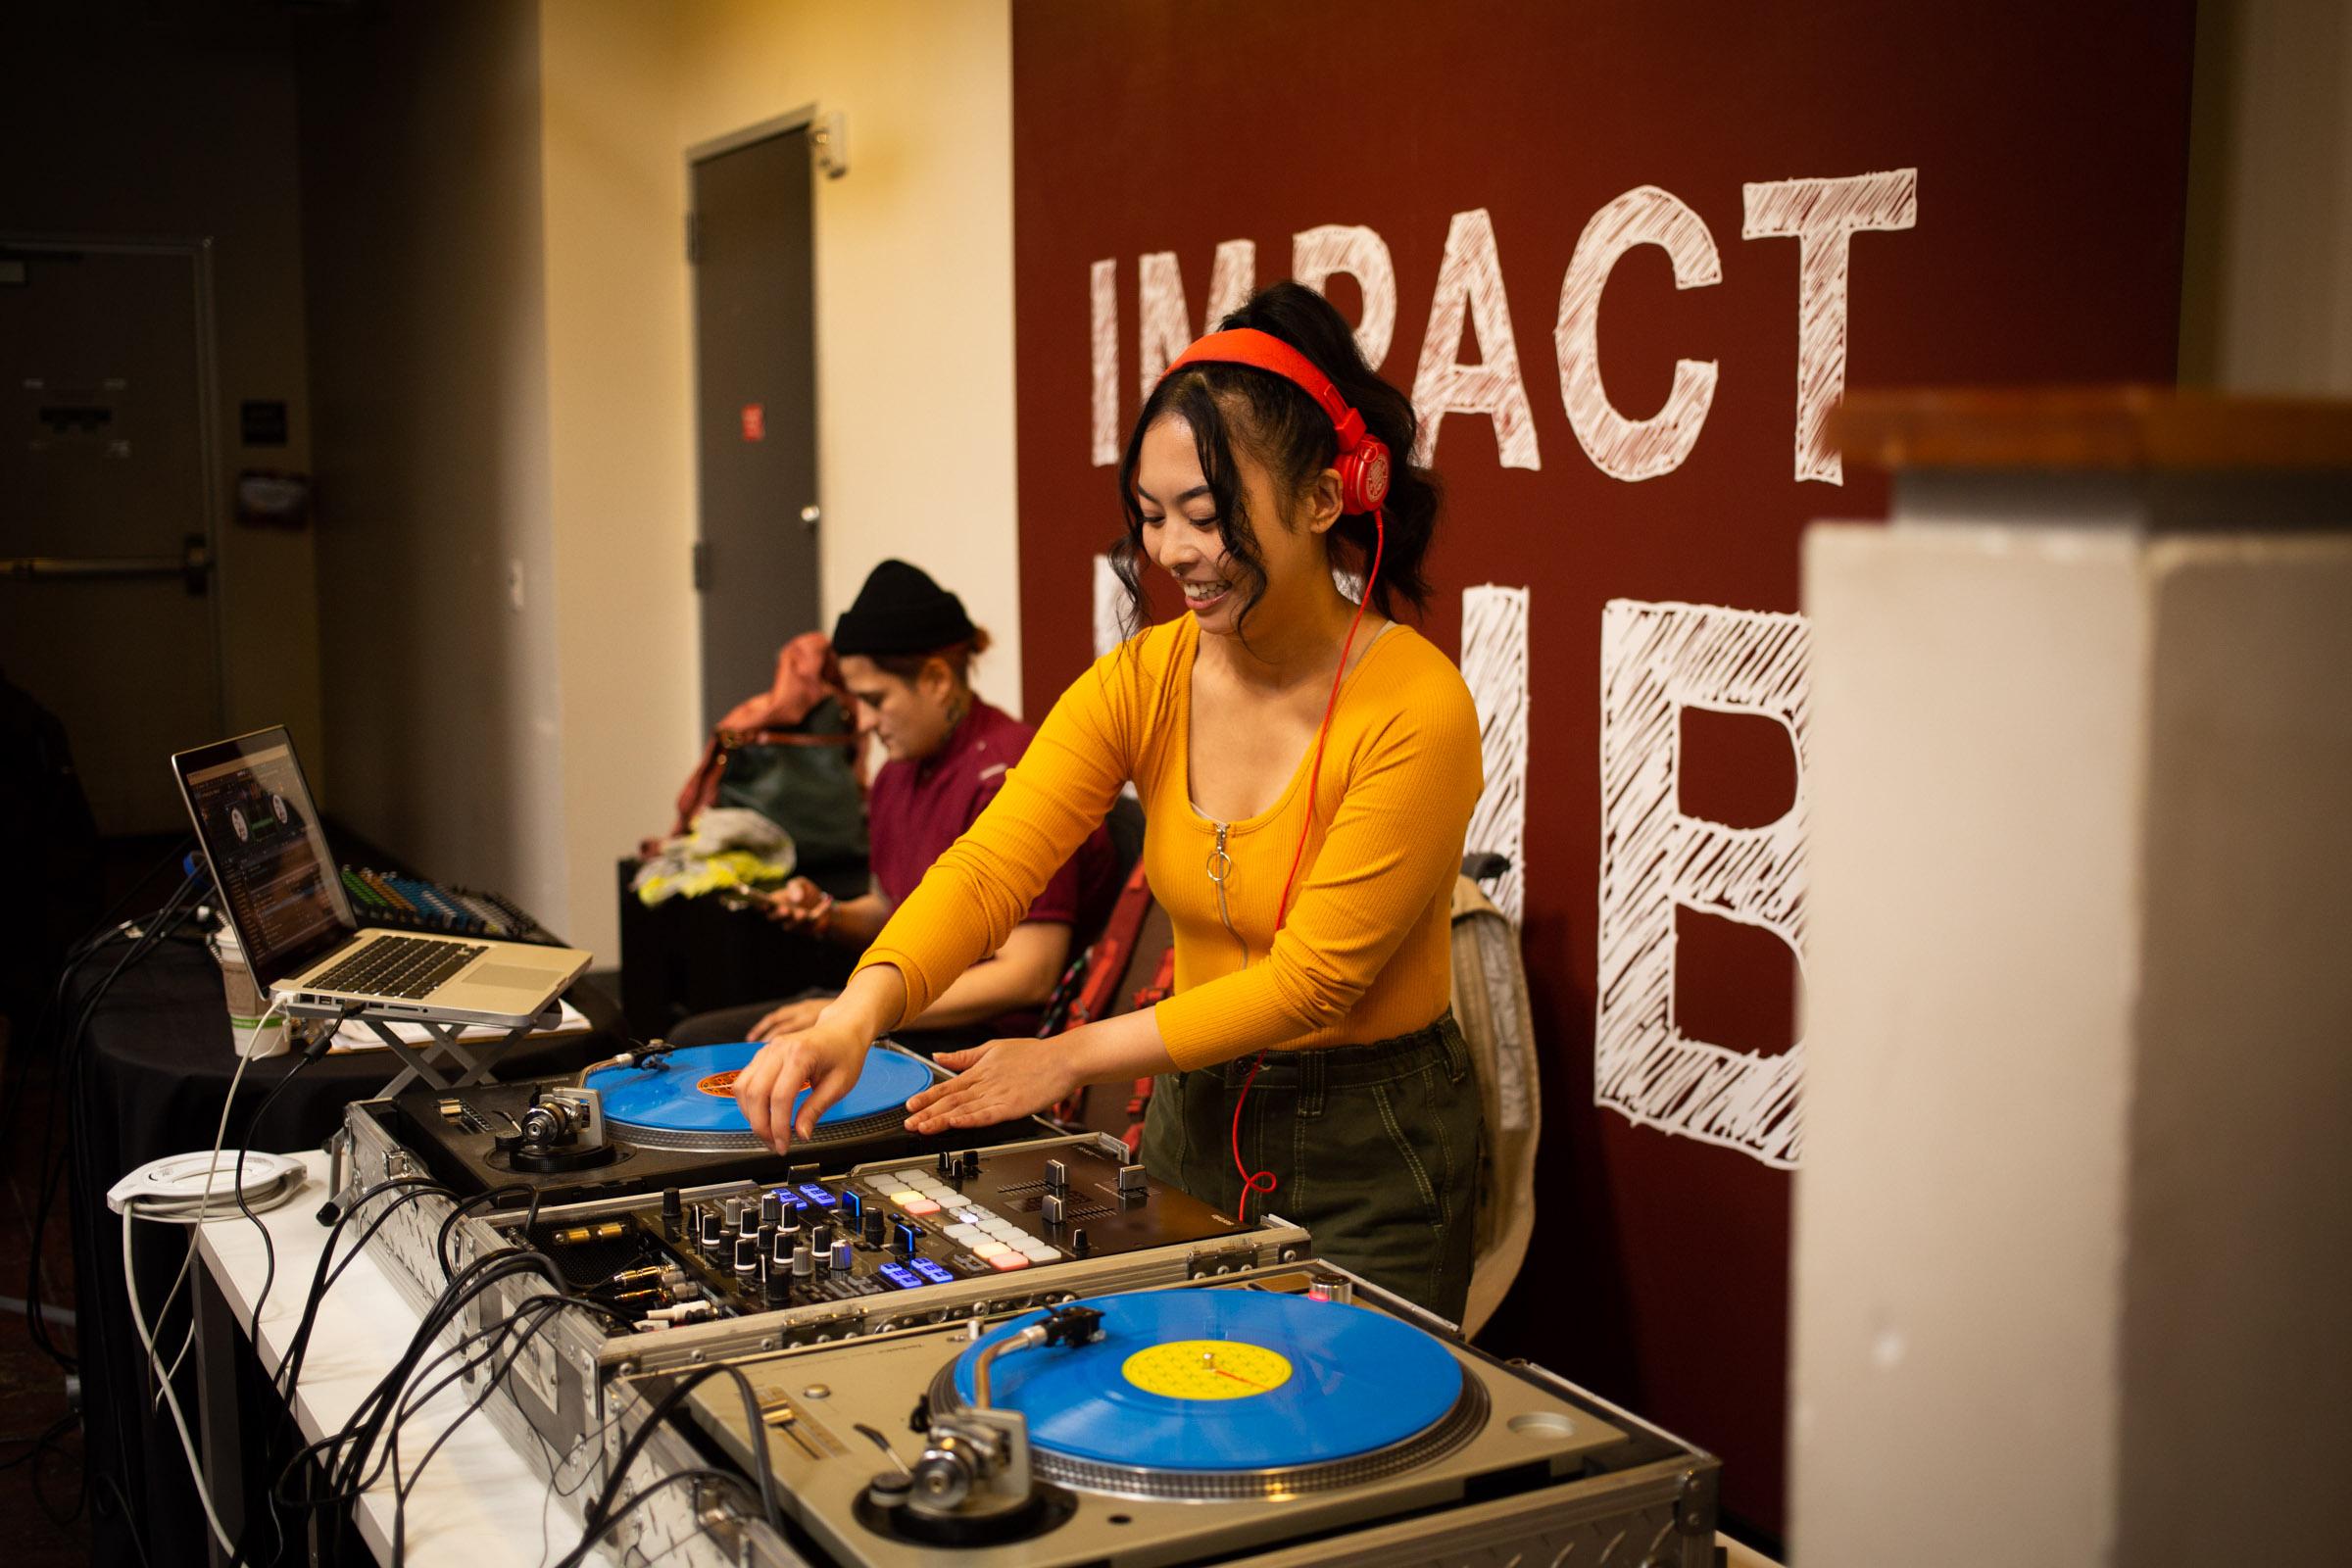 Natasha DJ Style Free. Photo by Tumay Aslay